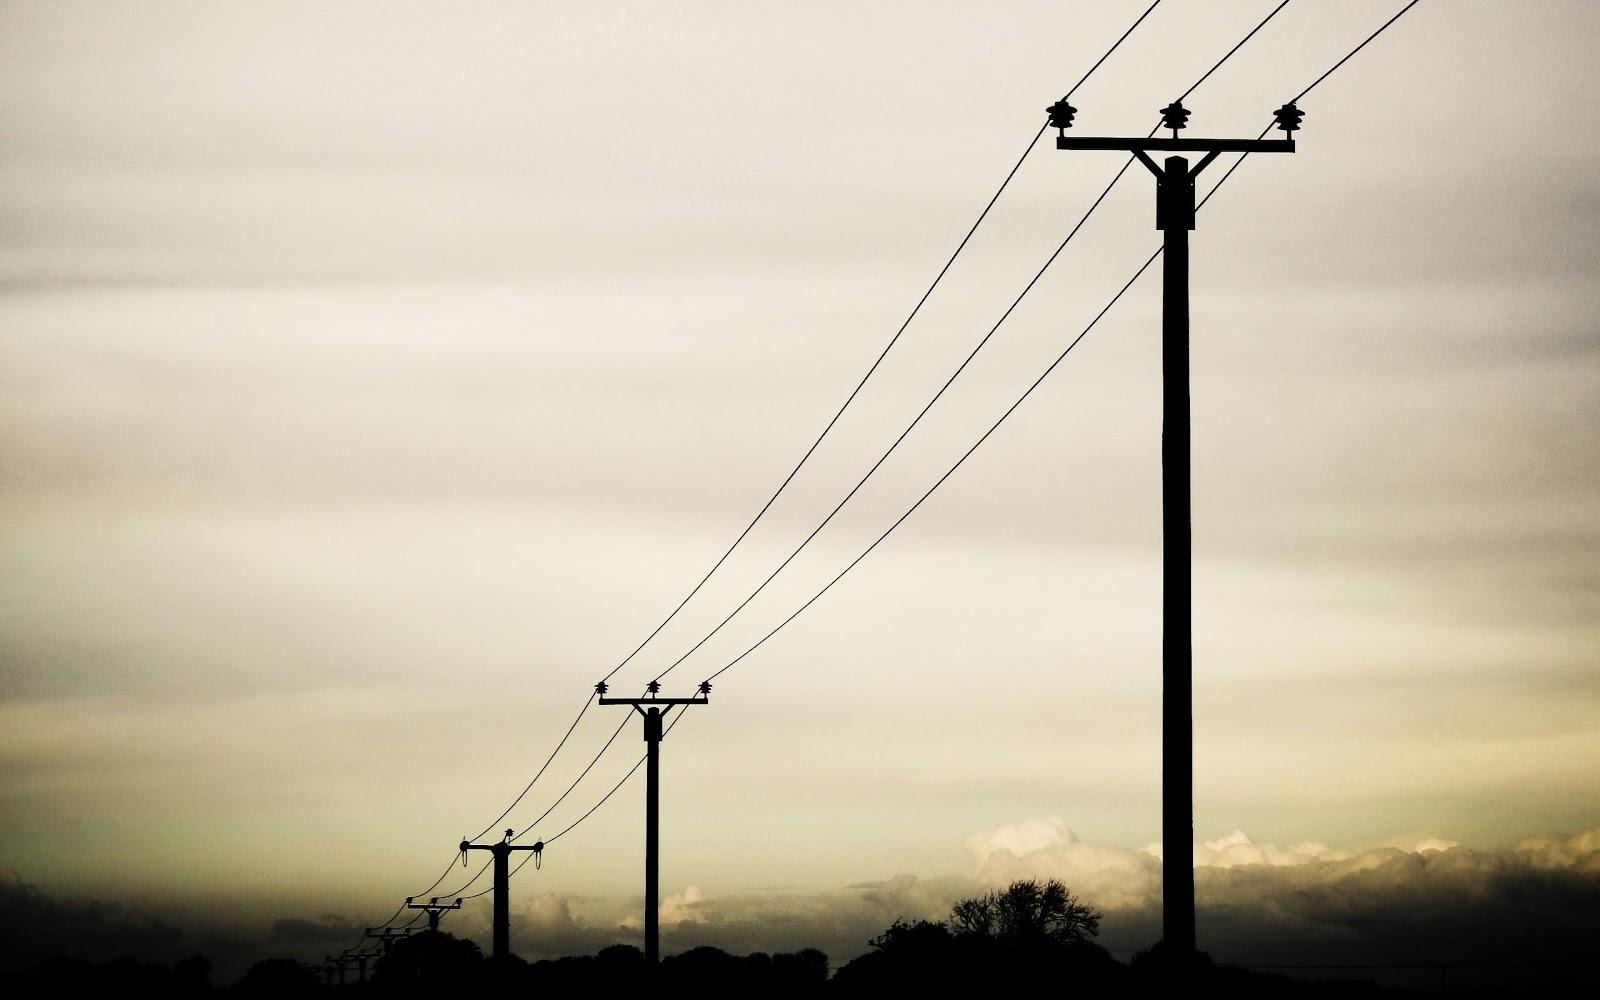 Sentir al rev s casa xi - Cables de electricidad ...